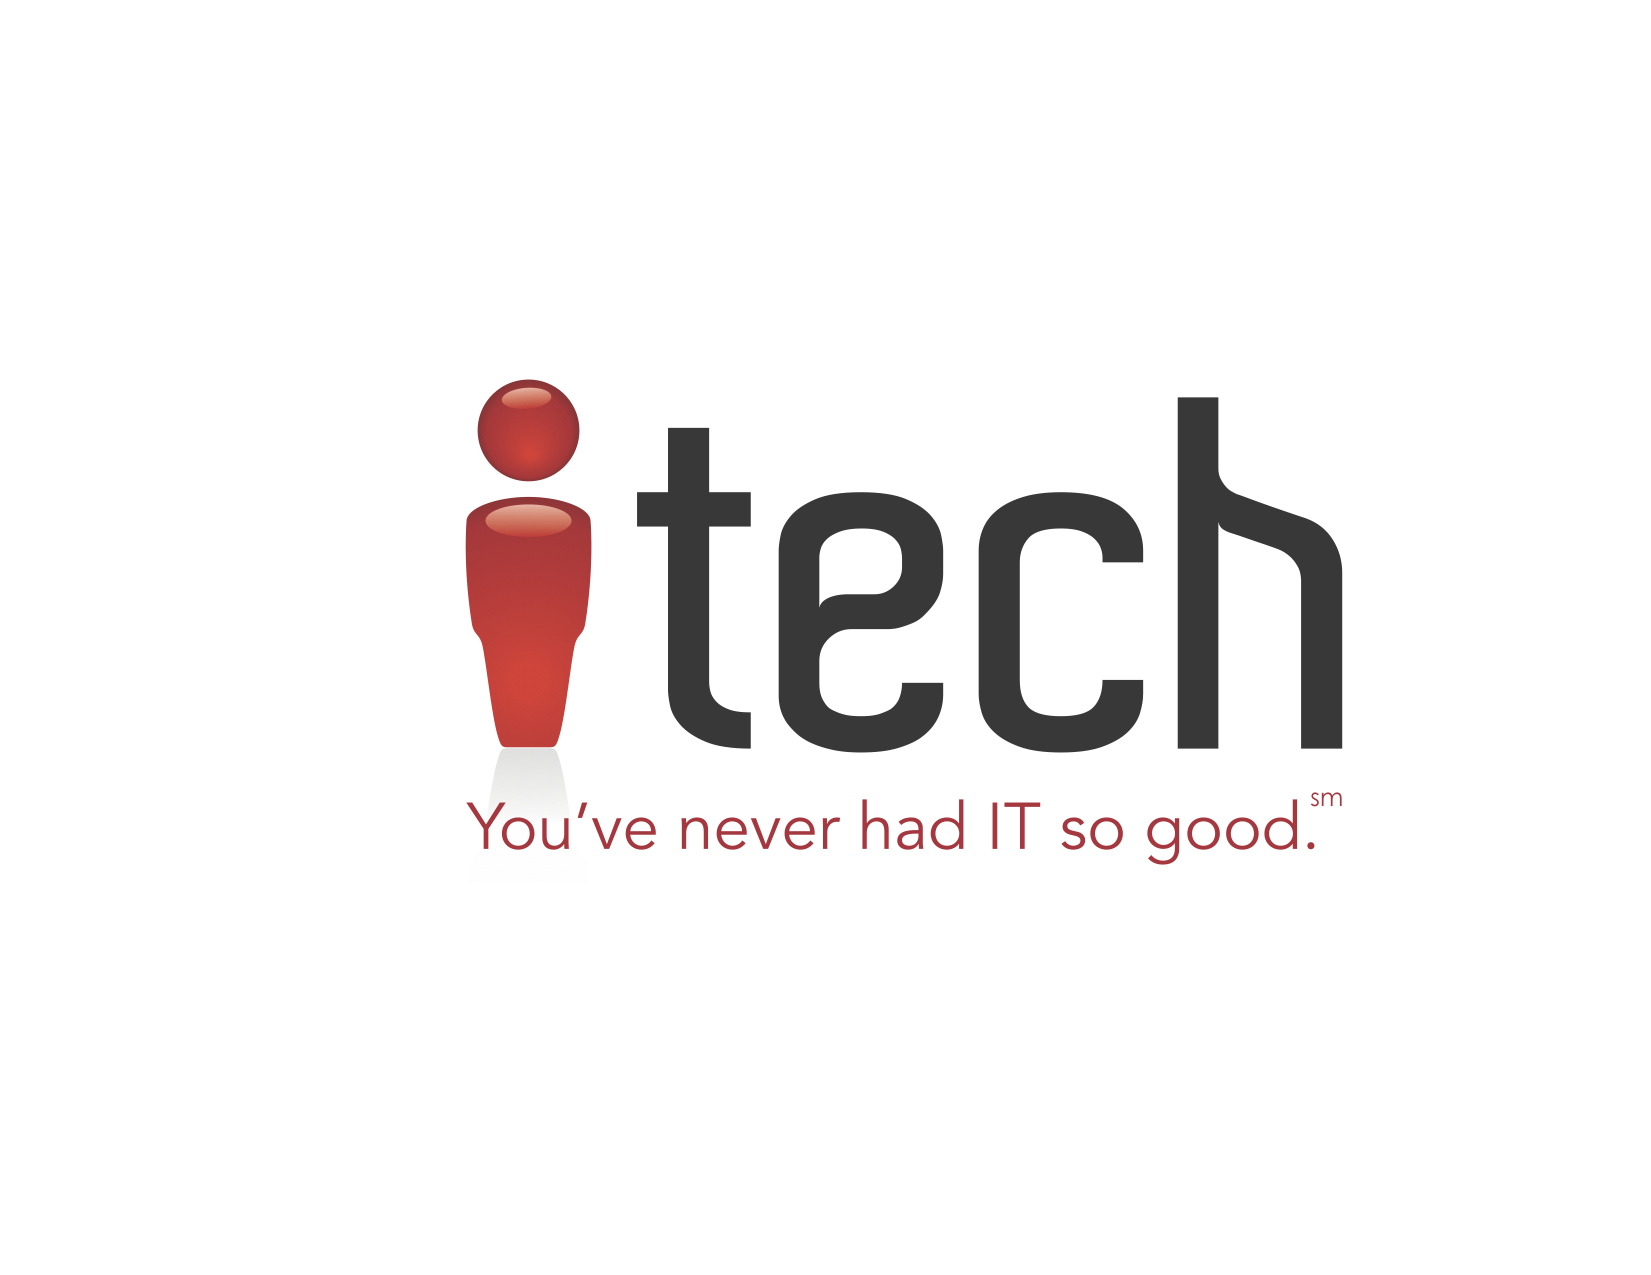 RediTech